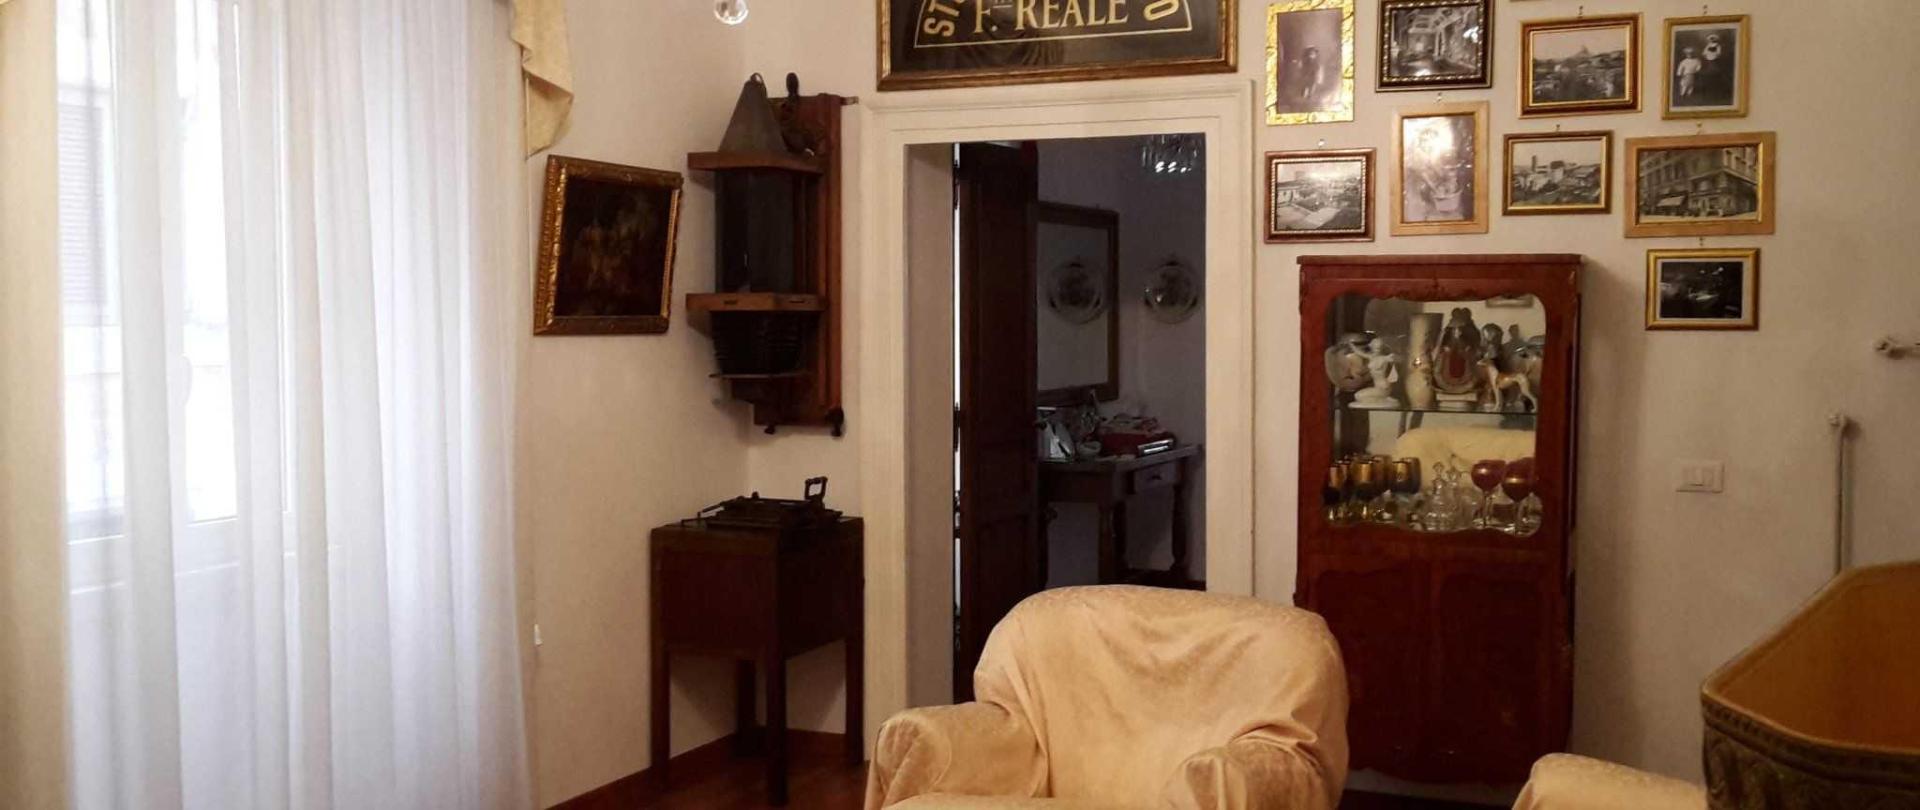 gold-salone-1-2.jpg